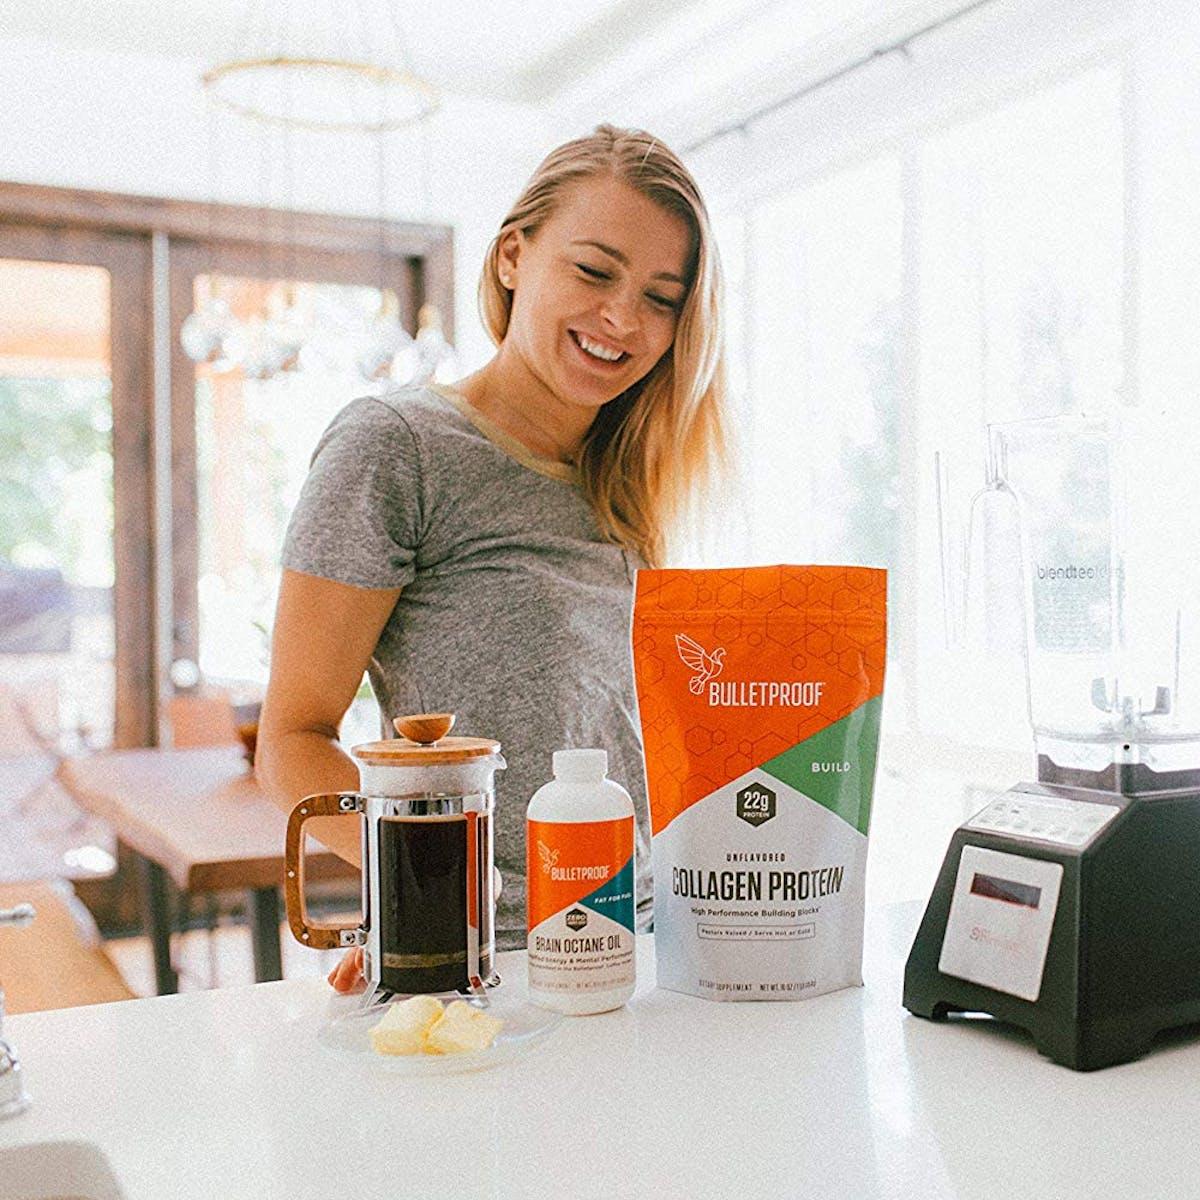 5 Nootropic Coffee Brands We're Into